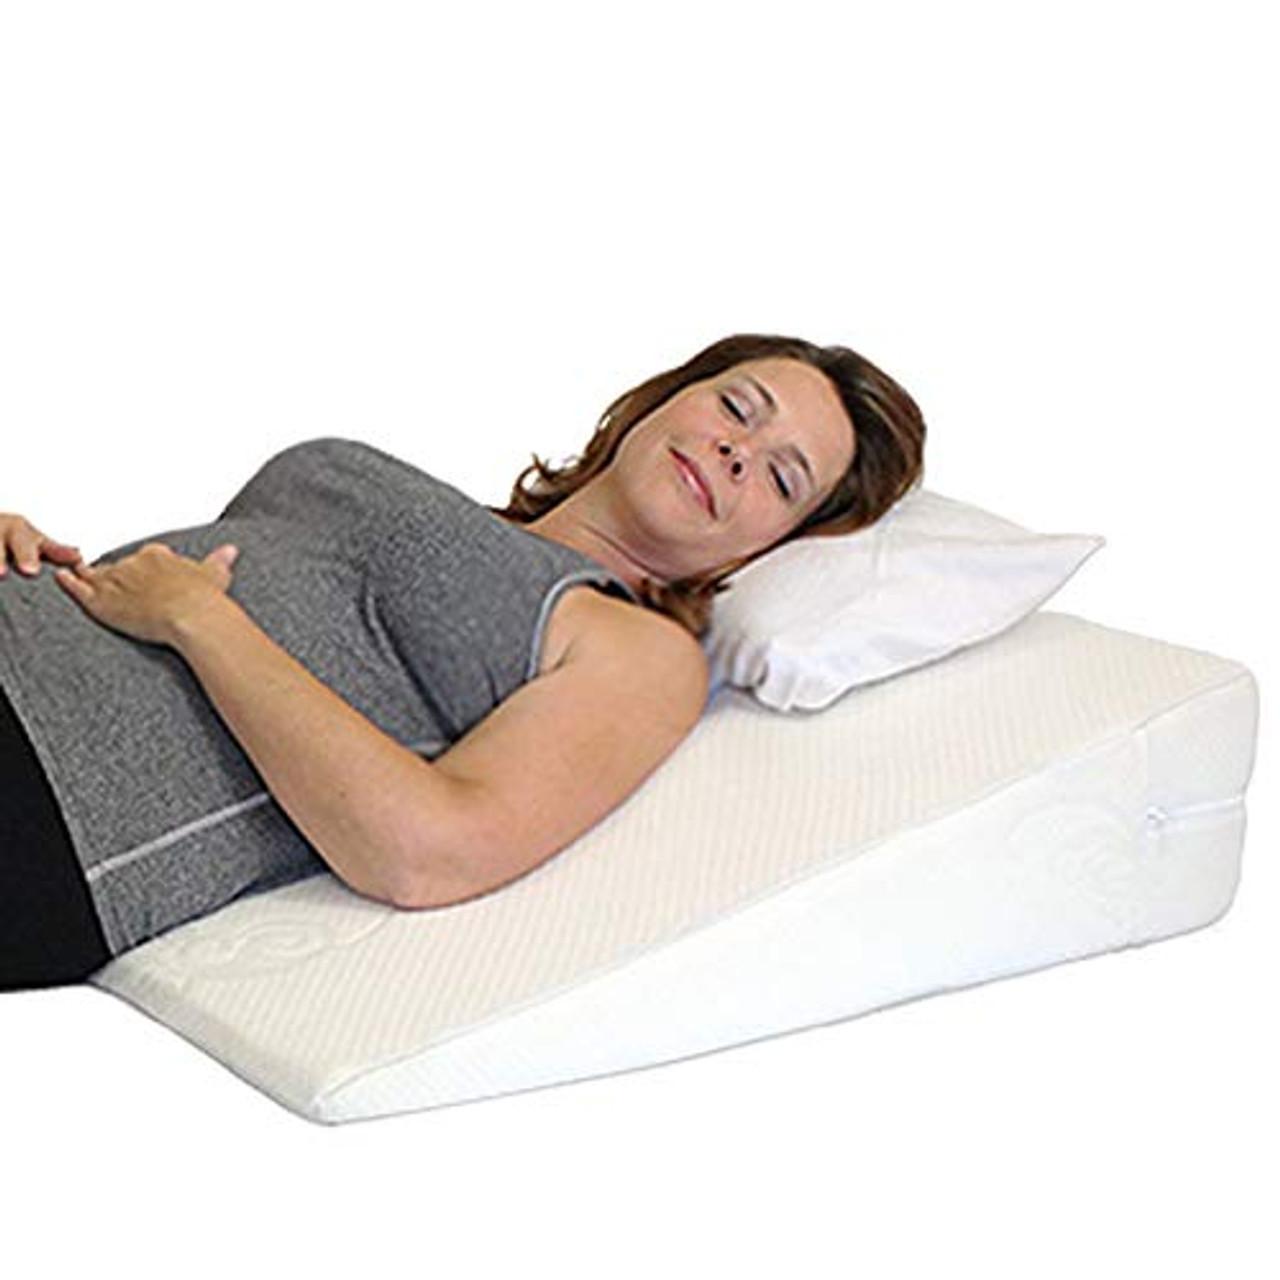 acid reflux wedge pillow usa made